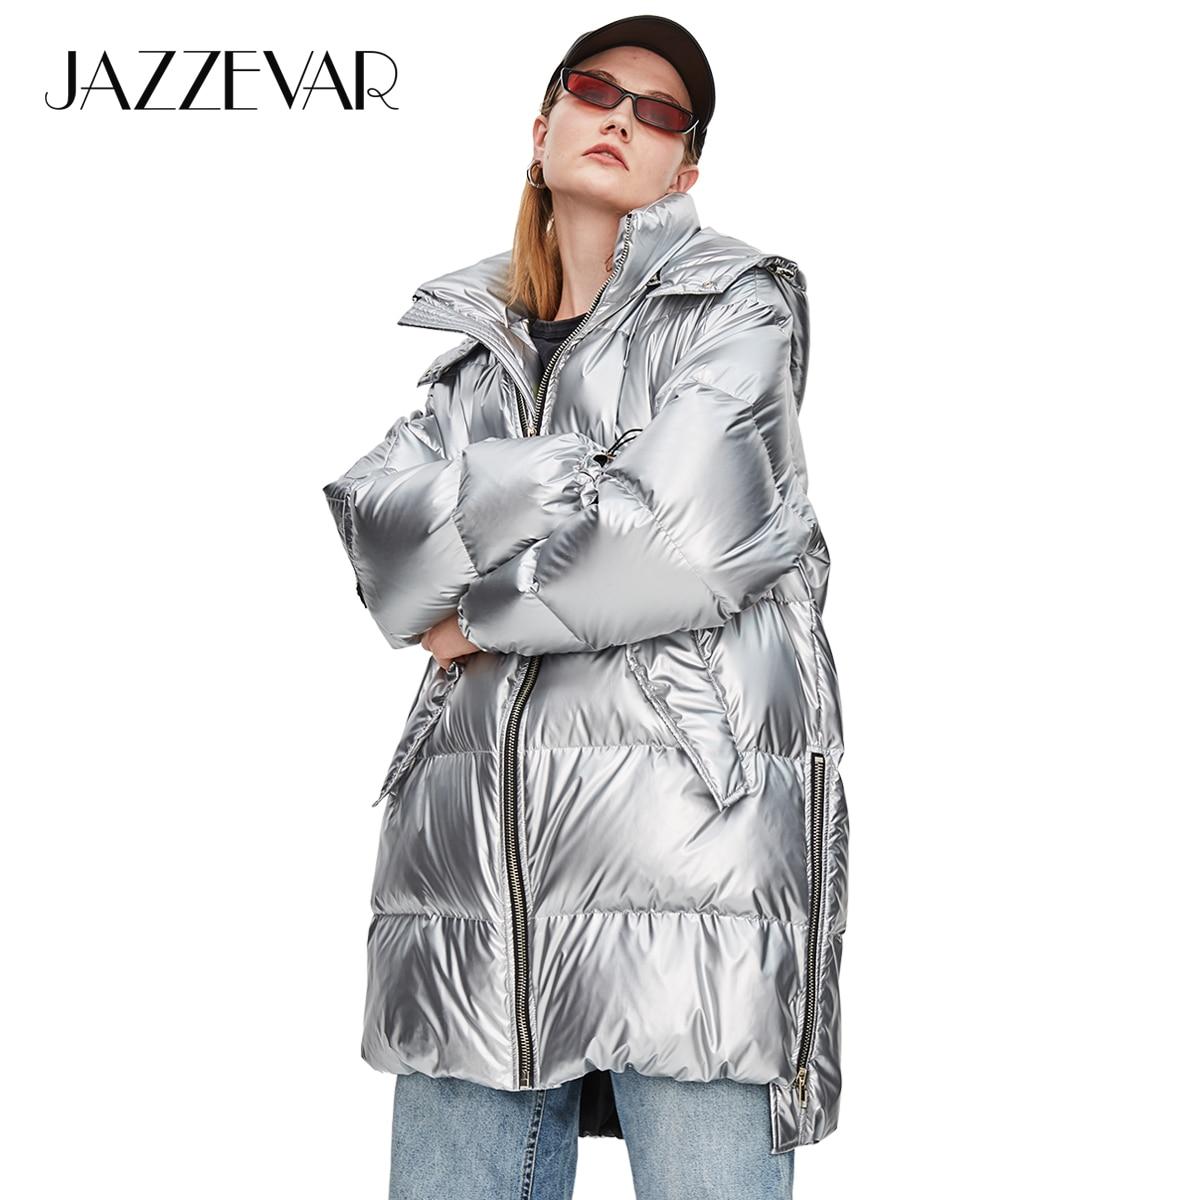 JAZZEVAR 2019 Winter New Fashion Street Womens Edgy Sliver Long Down Jacket Cool Girls Zipper Hooded